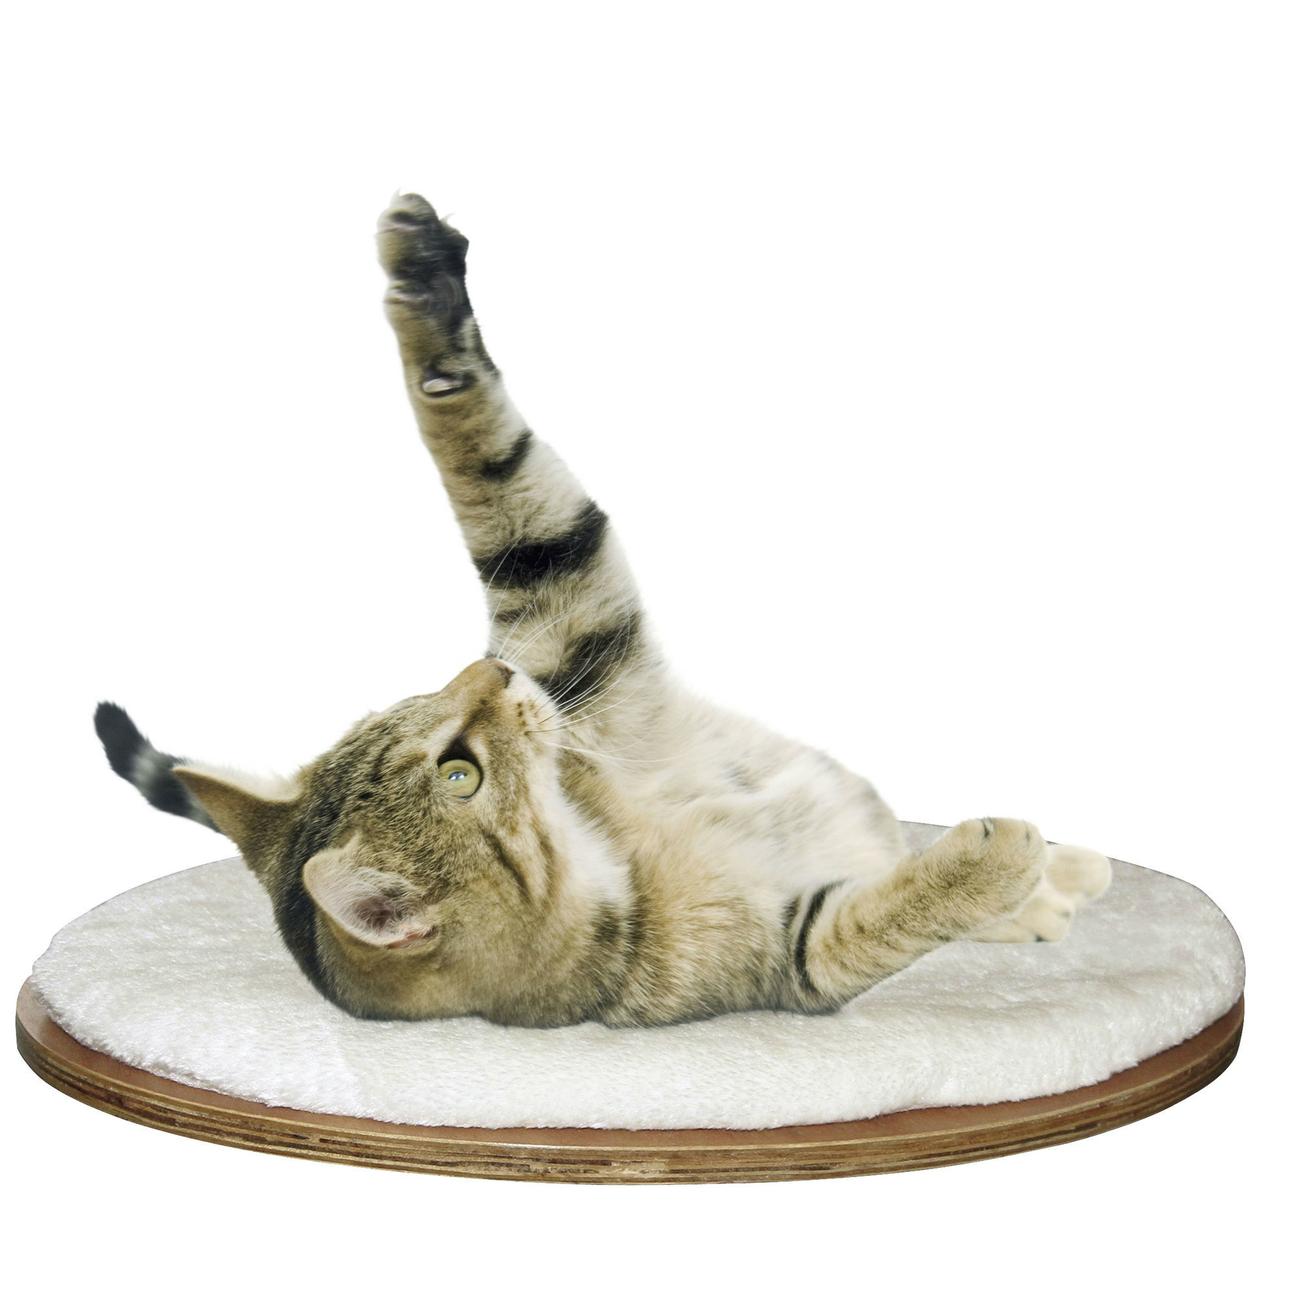 Kerbl Wandliegebrett Dolomit für Katzen, 50 x 35 x 1,5 cm